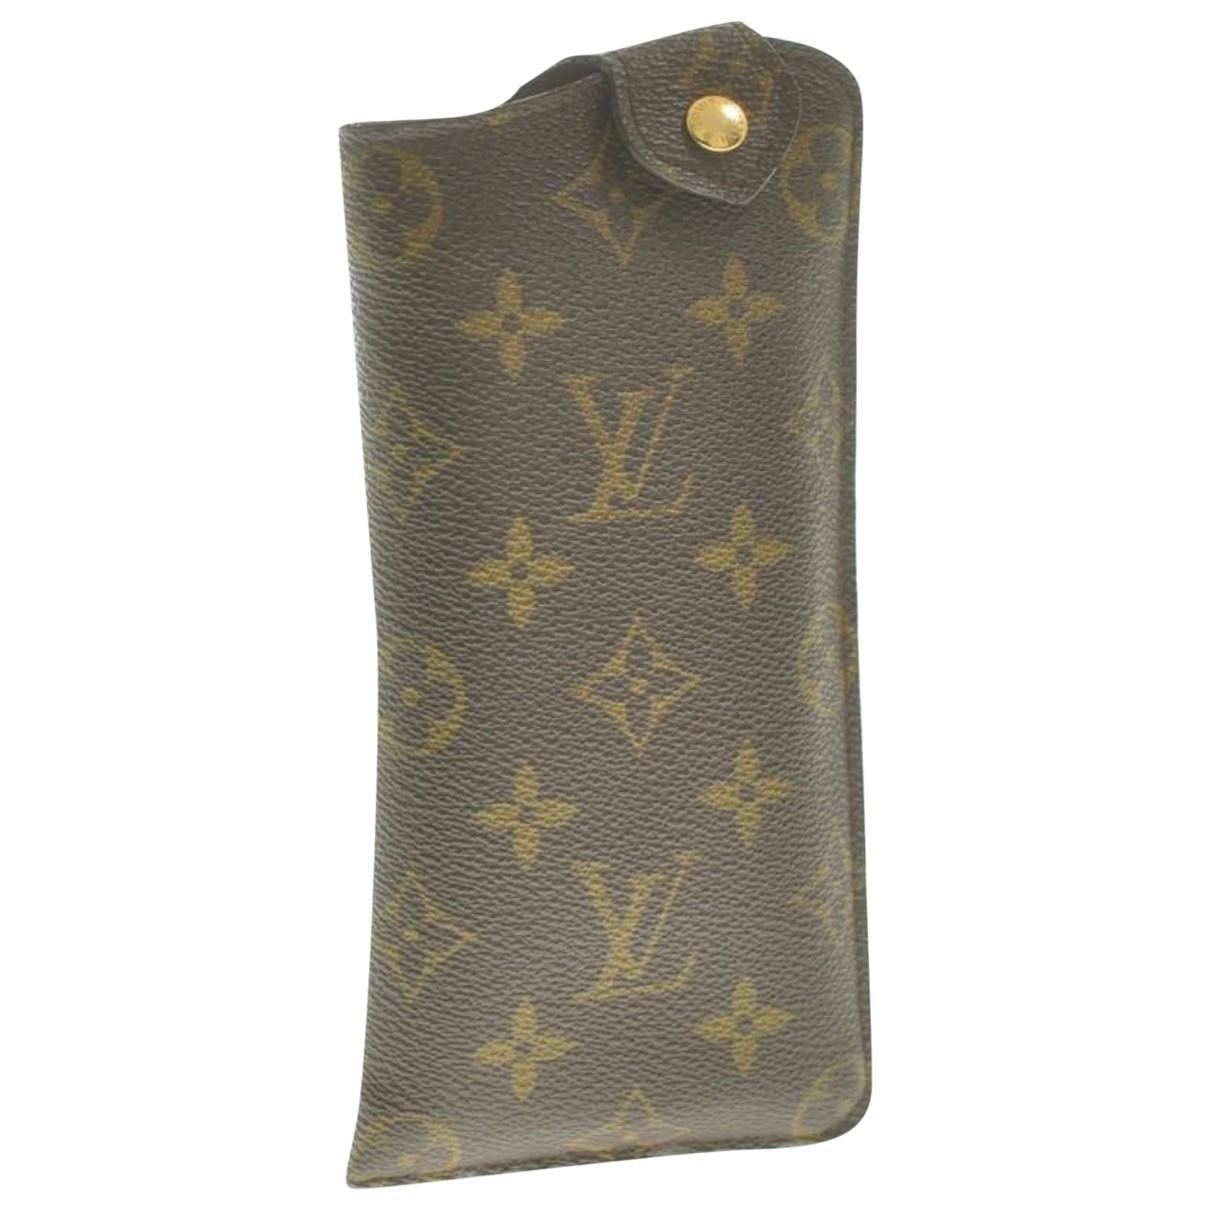 Louis Vuitton \N Brown Cotton scarf for Women \N